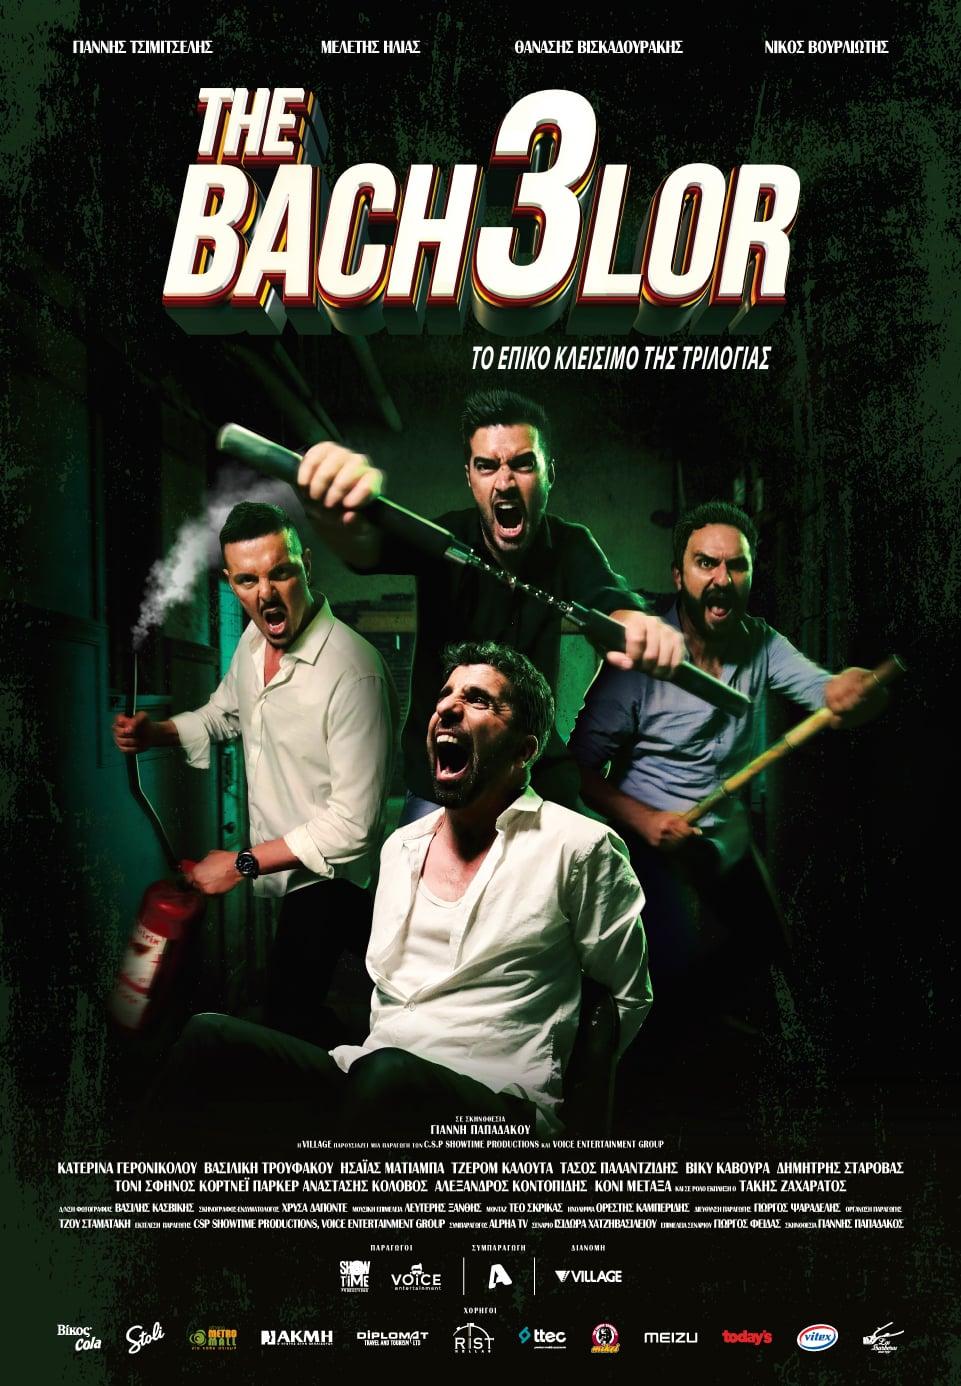 Regarder The Bachelor 3 en streaming gratuit